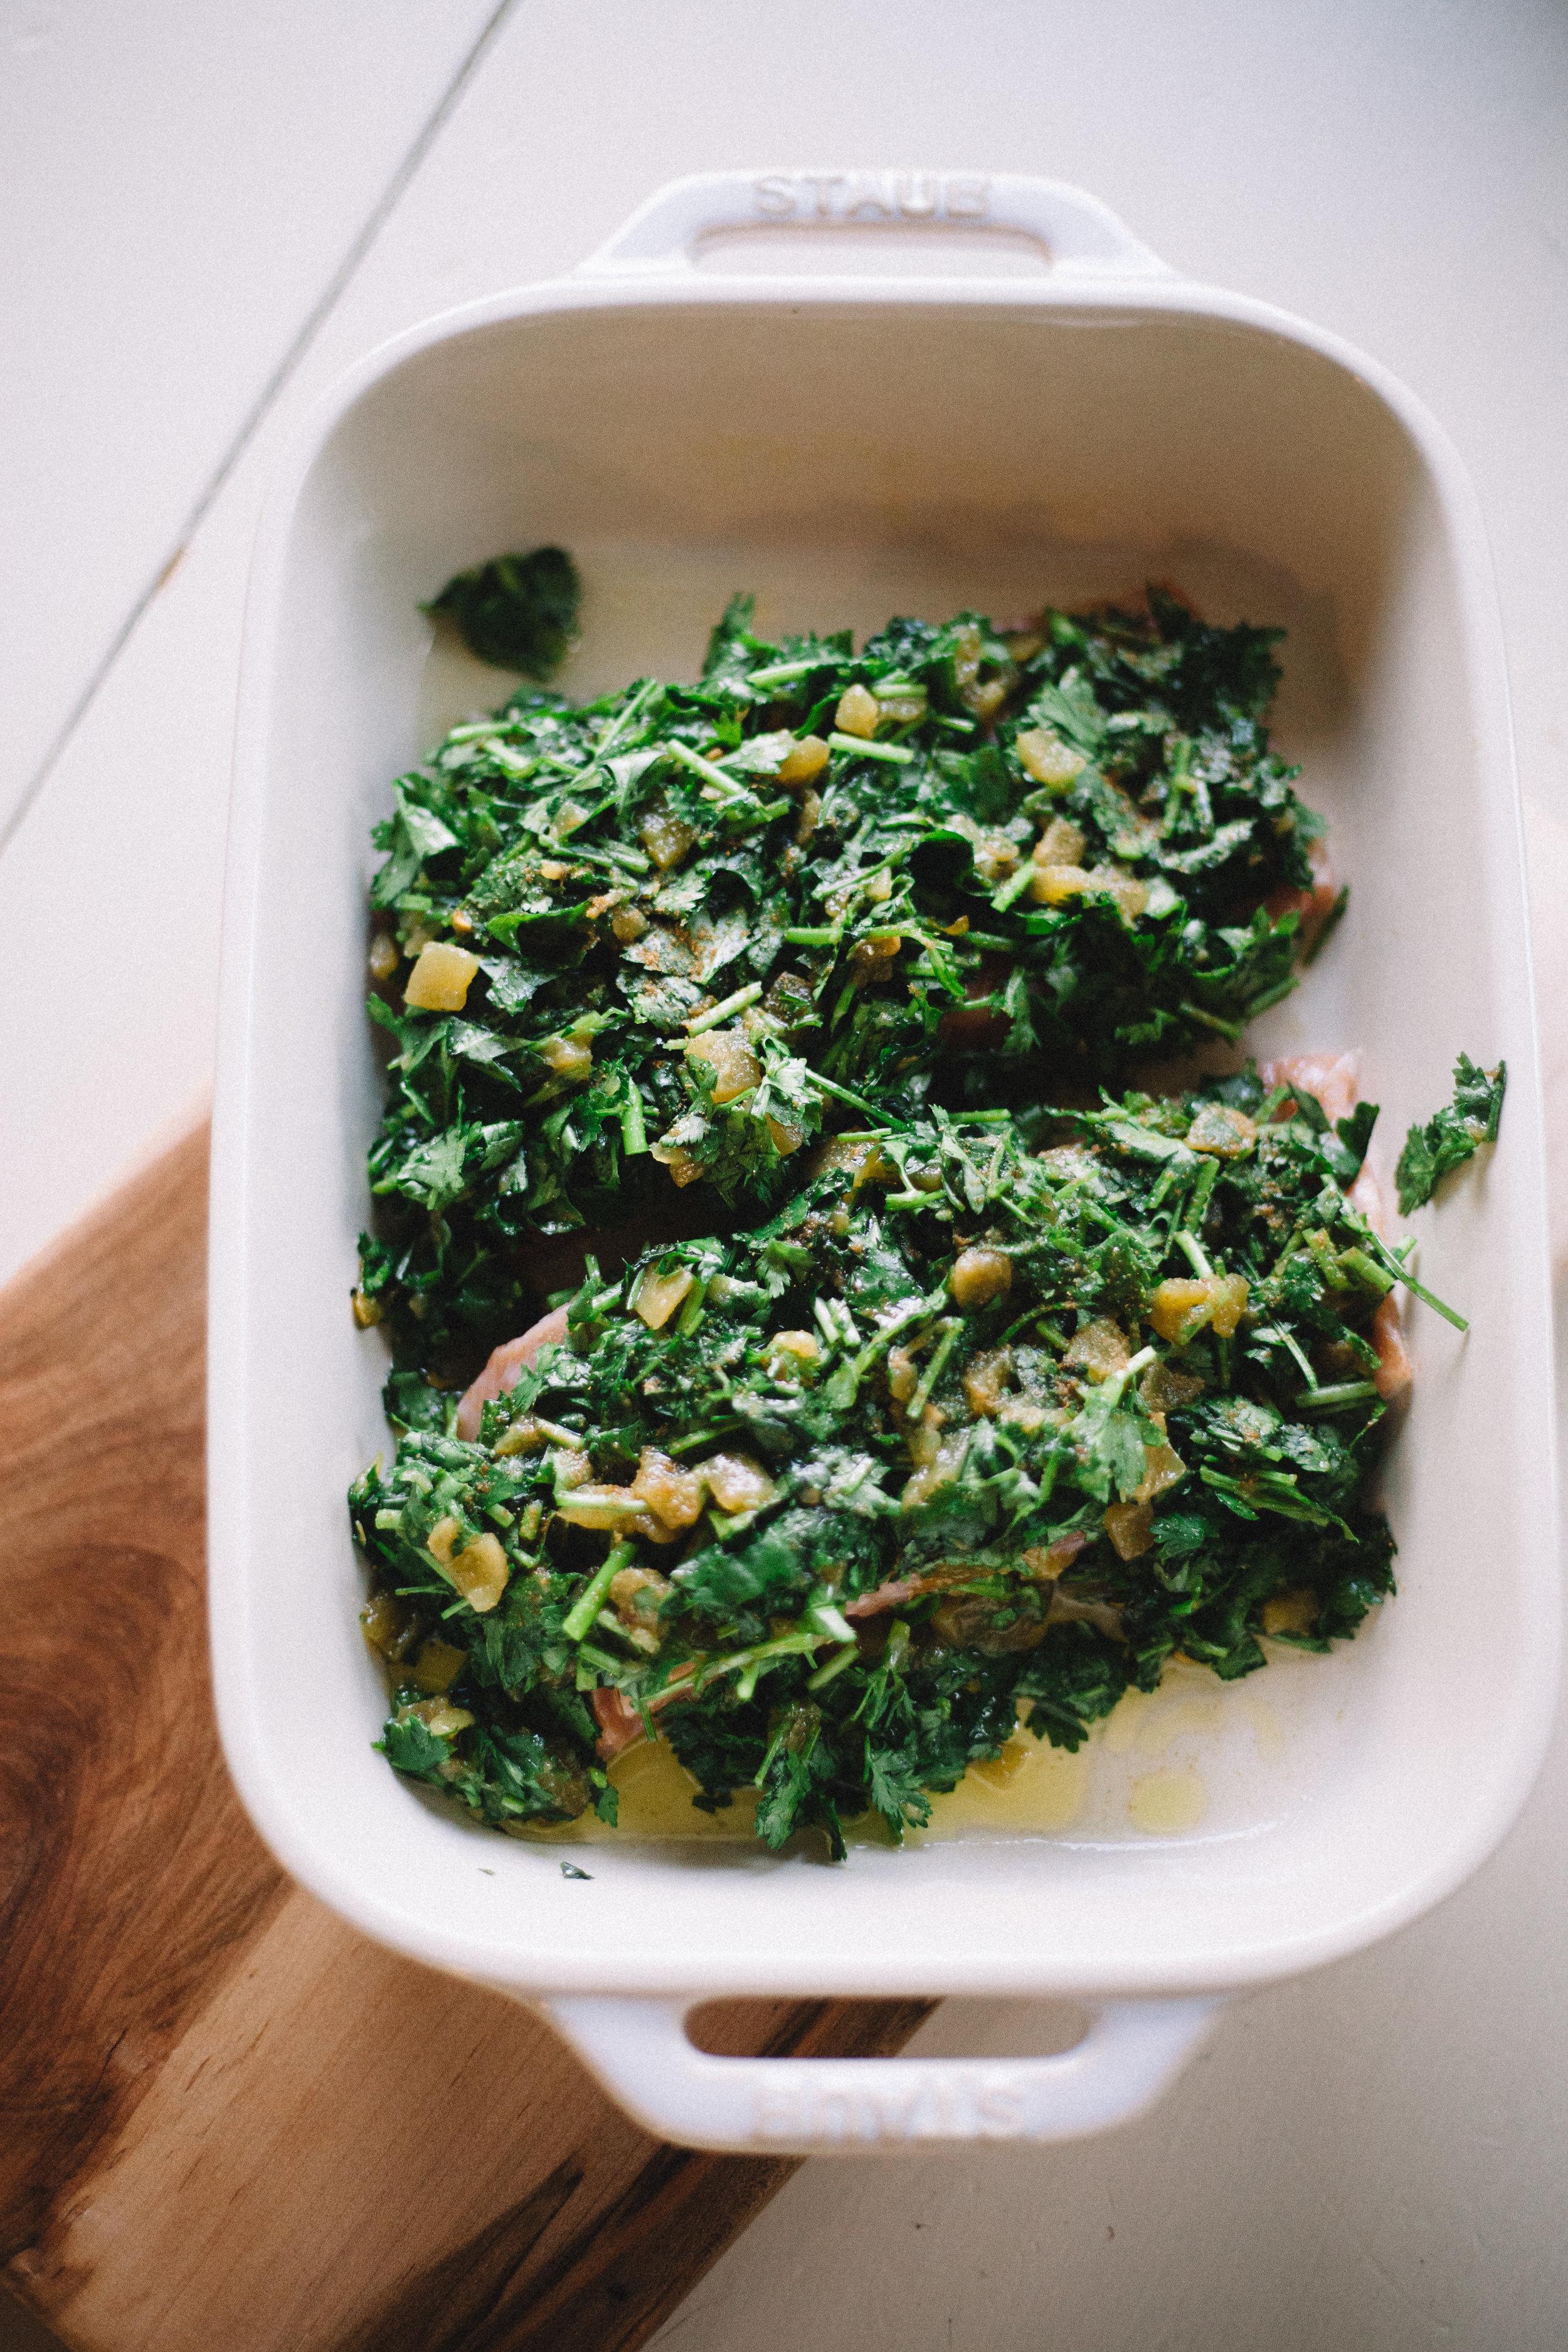 baked salmon with cilantro, chiles and lime | marina elaine gunn martin food